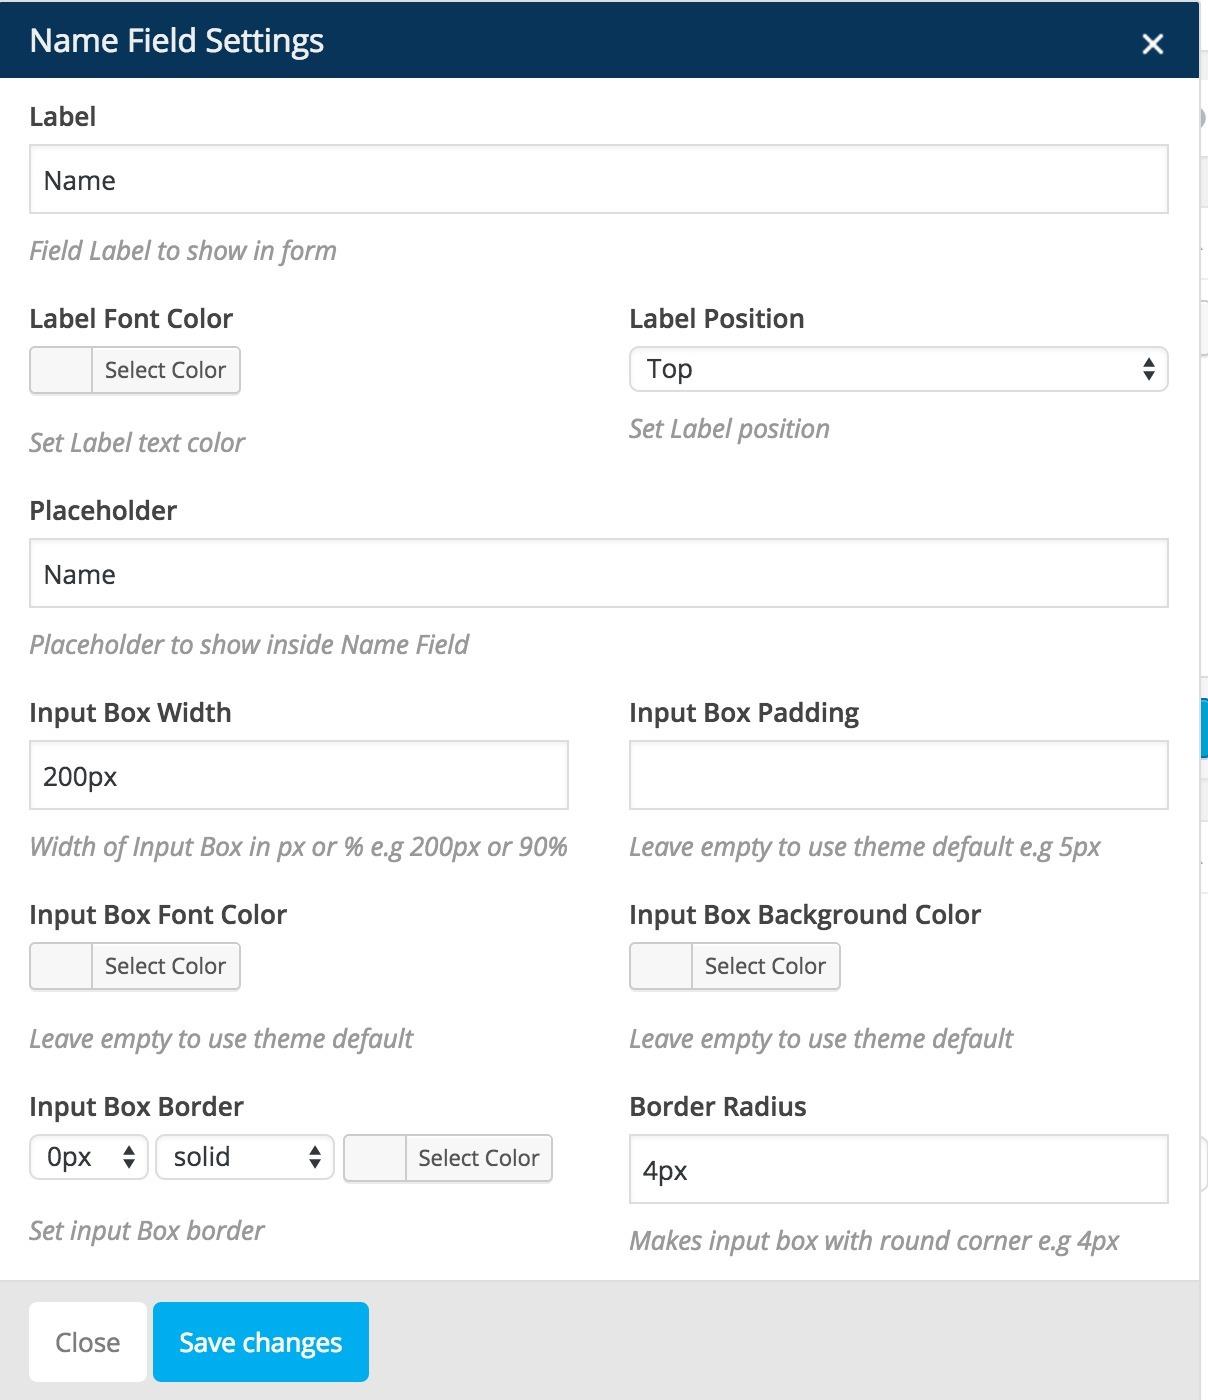 Background image mailchimp - Screeshots Custom Field Settings Jpeg Screeshots Email Field Setting Jpeg Screeshots Example Mailchimp Form Png Screeshots Example Vcmailchimp Form1 Png